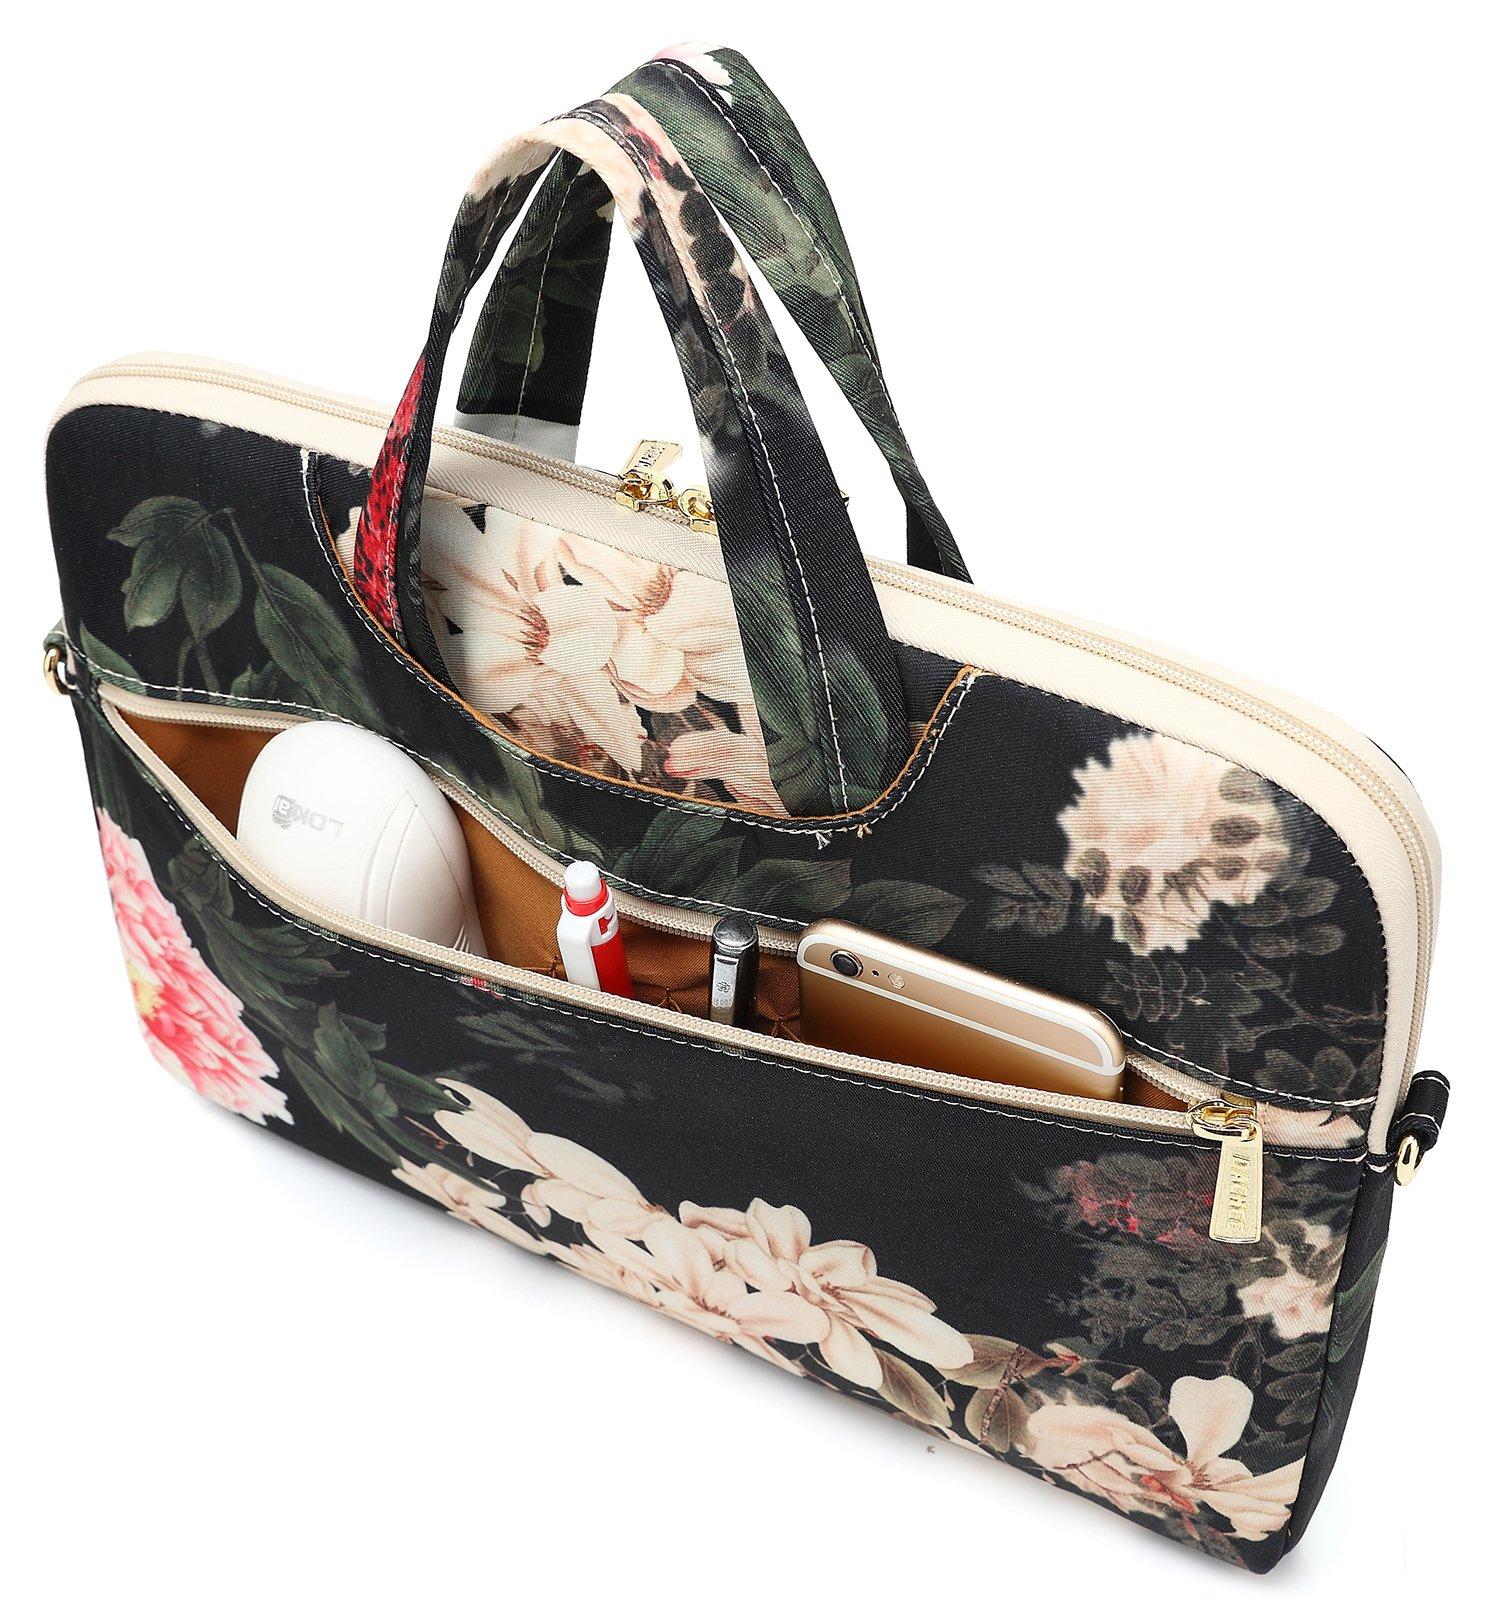 DACHEE Black Peony Patten Waterproof Laptop Shoulder Messenger Bag Case Sleeve for 14 Inch 15 Inch Laptop Case Laptop Briefcase 15.6 Inch by DACHEE (Image #2)